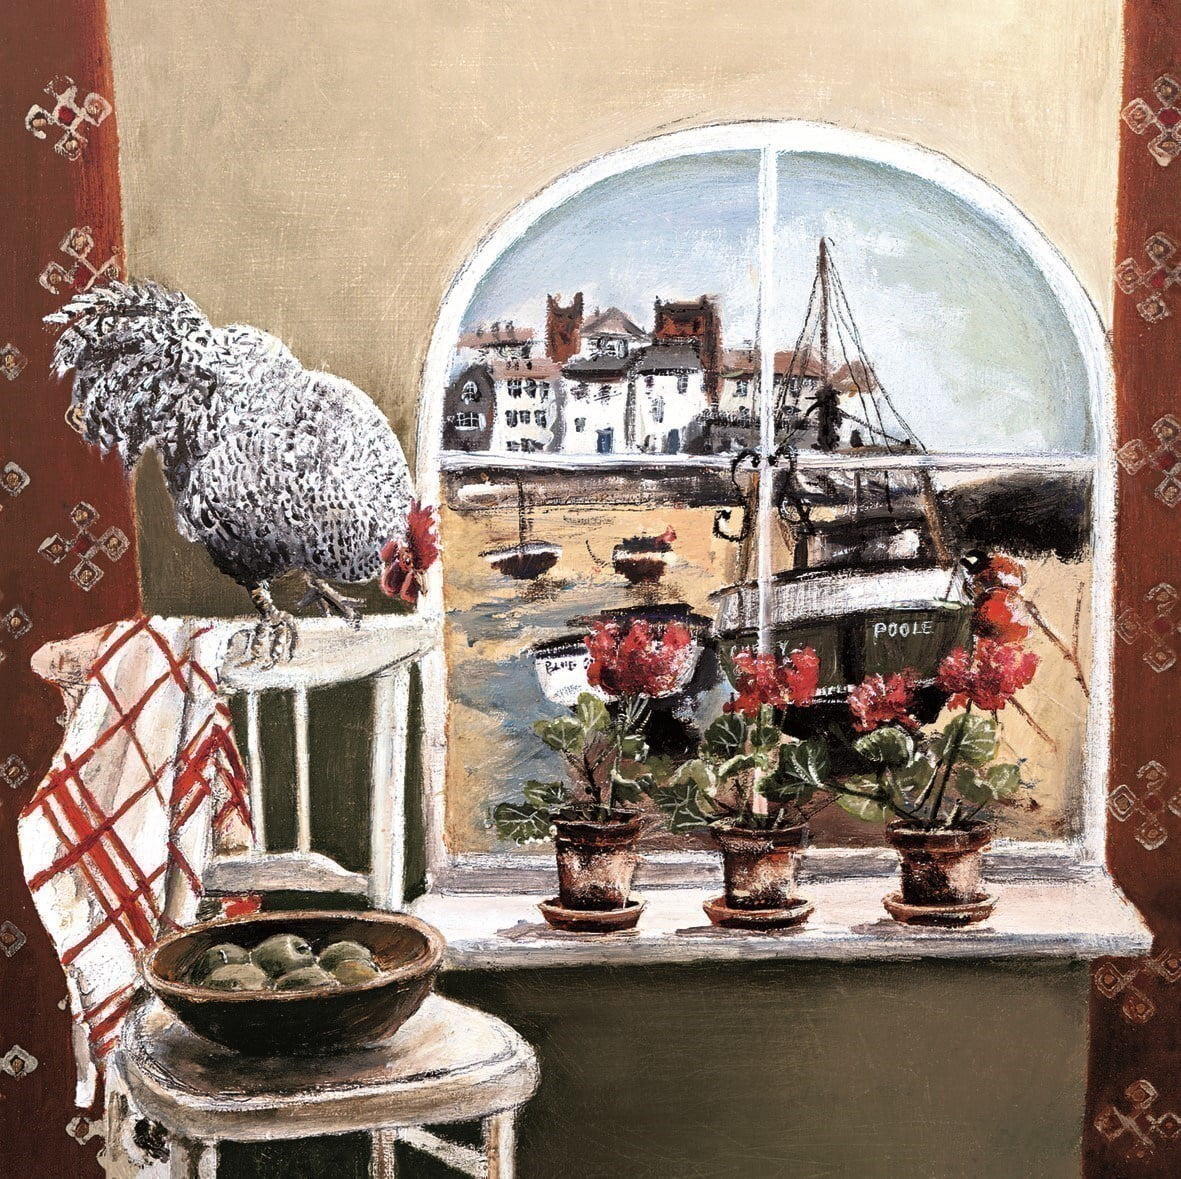 Home to Roost ~ Rebecca Lardner